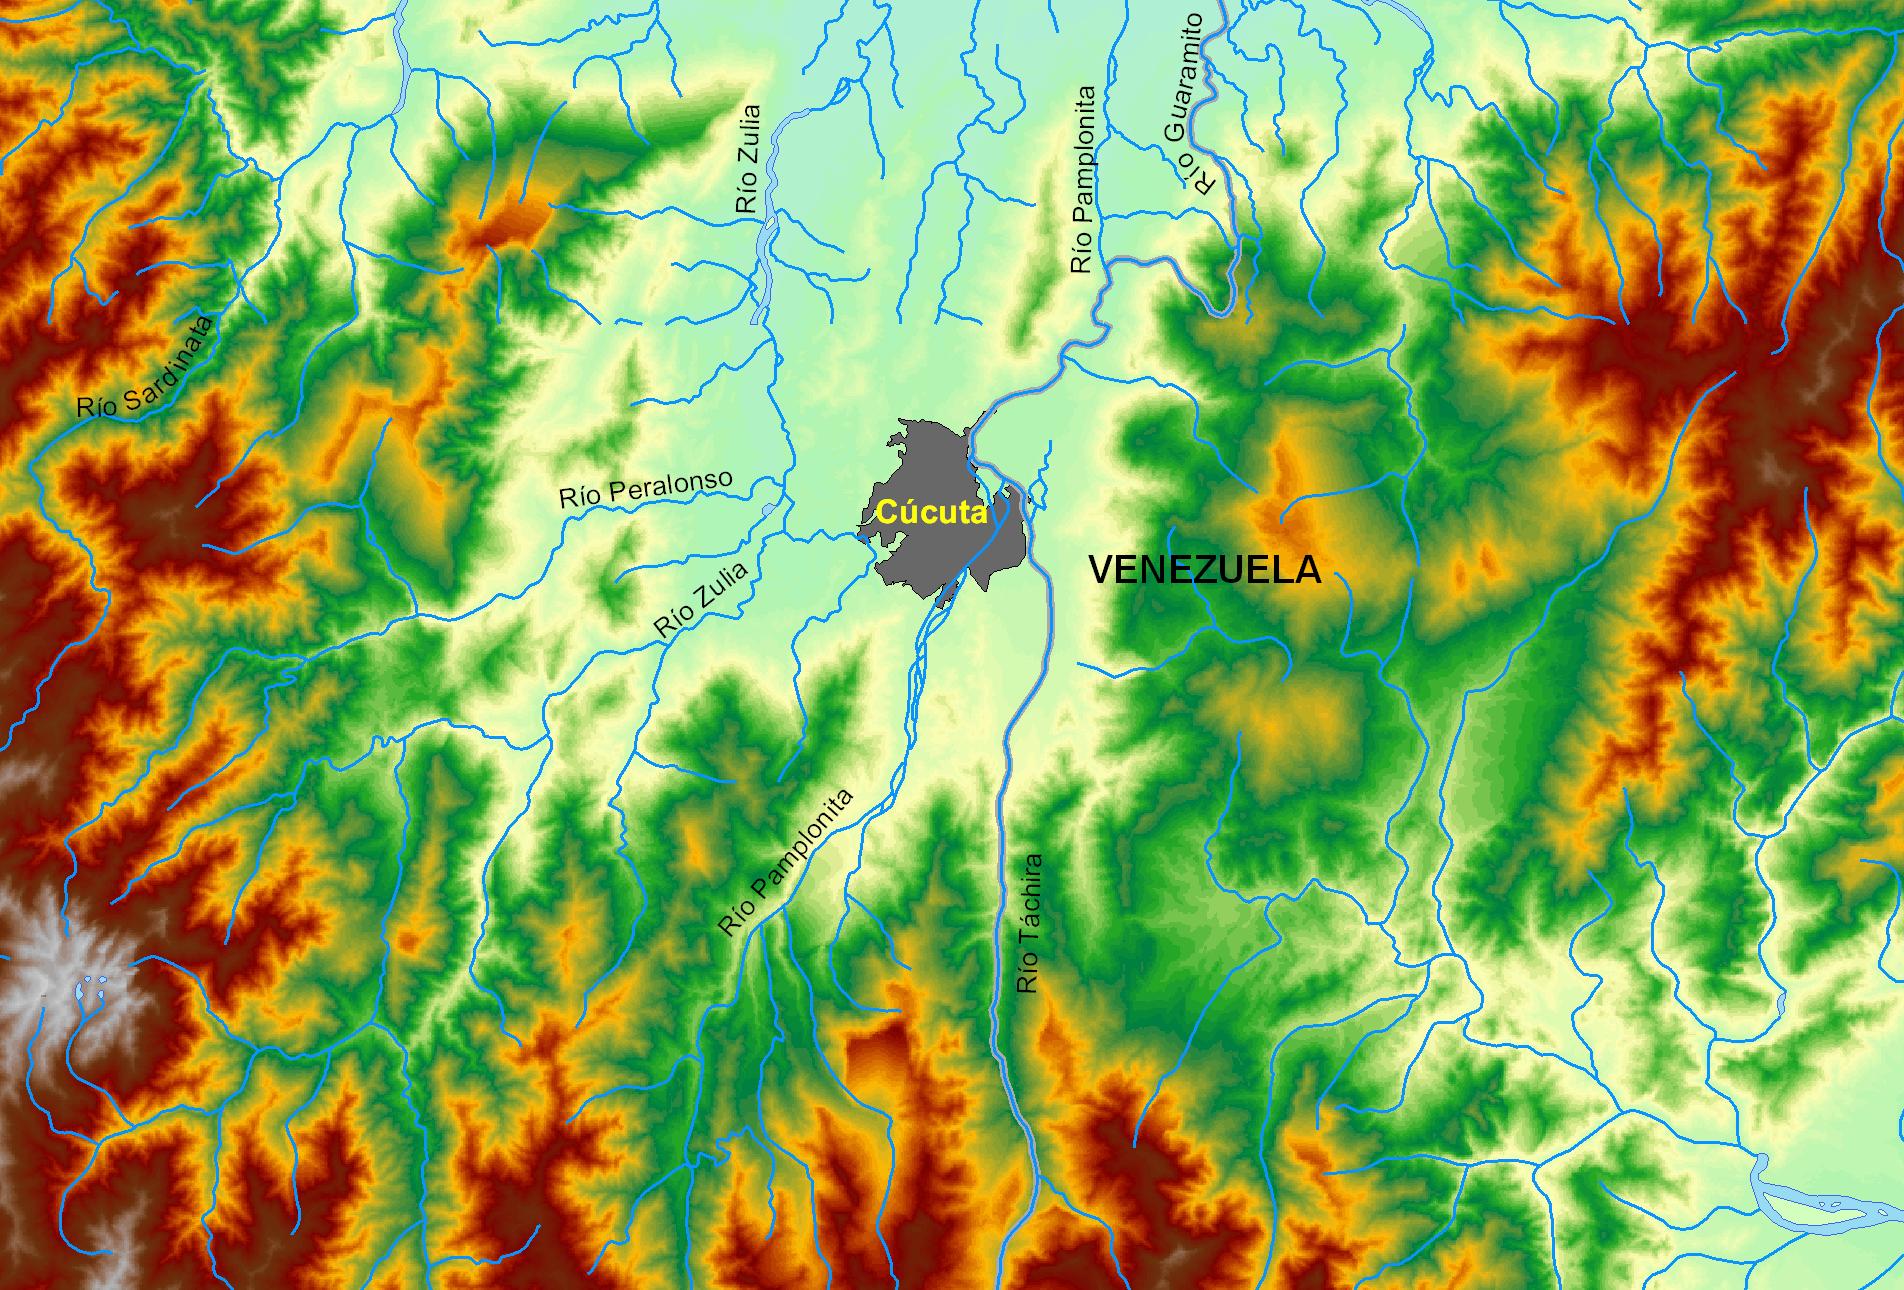 Mapa relieve Cúcuta, Colombia